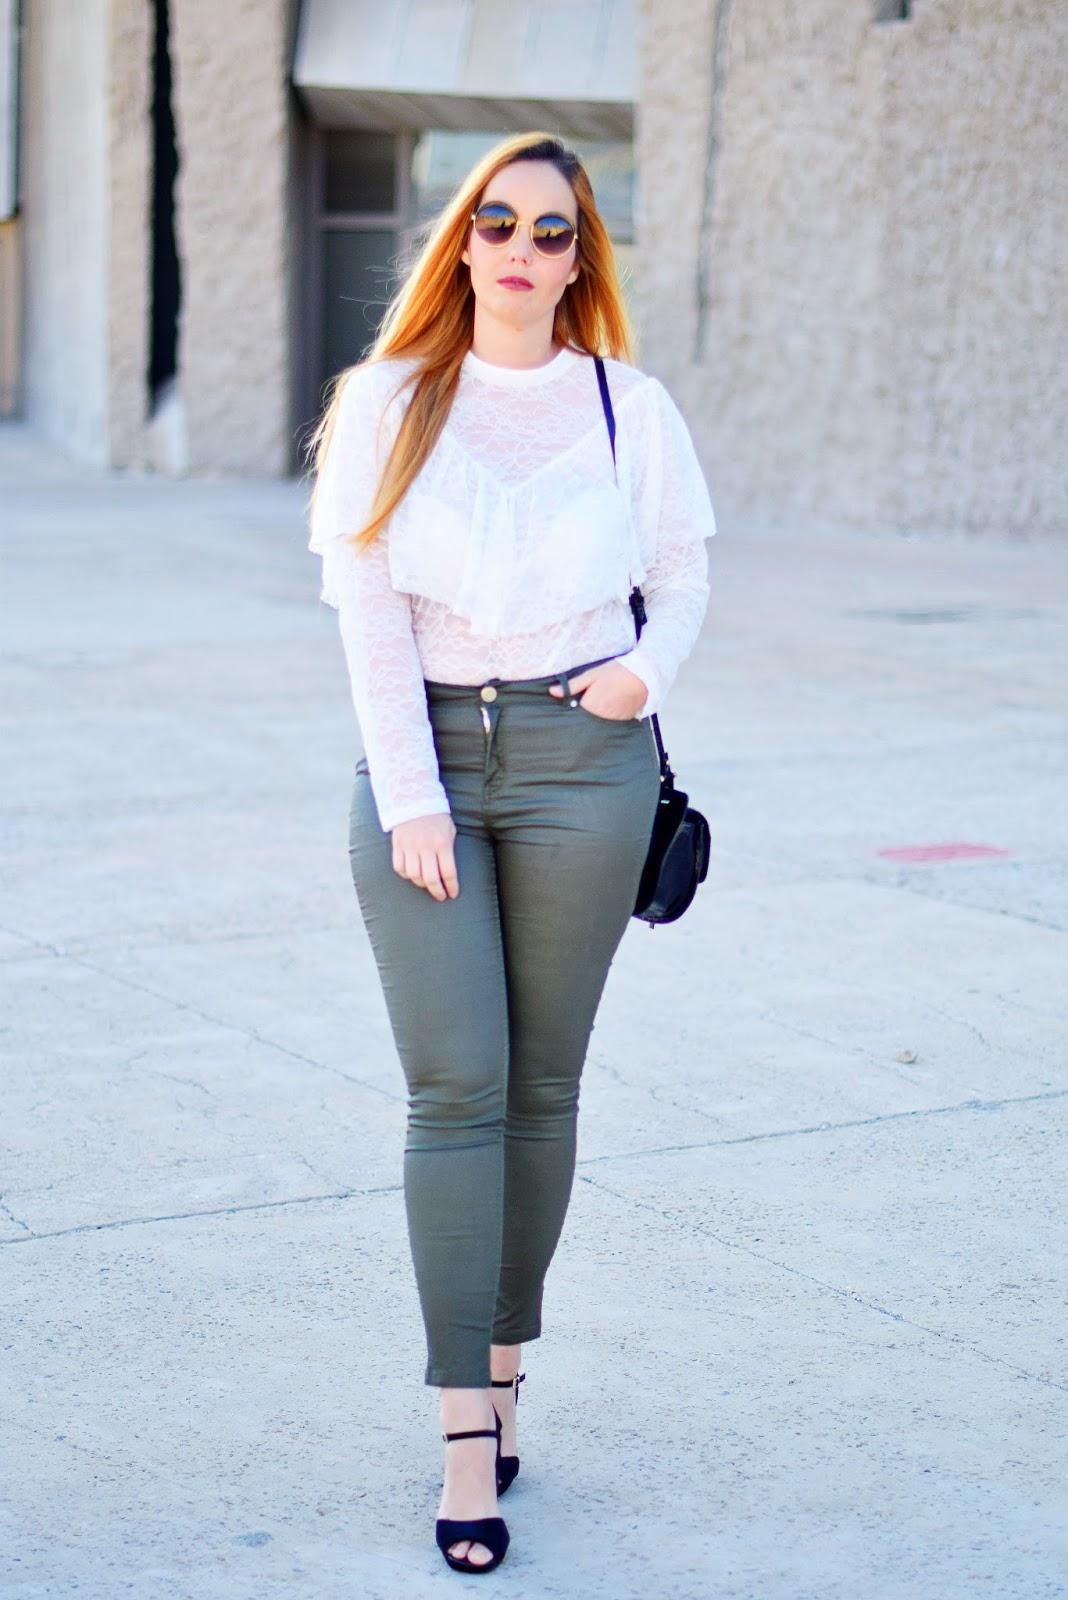 lace blouse, opticalh, woow, nery hdez, óptica herradores, gafas redondas